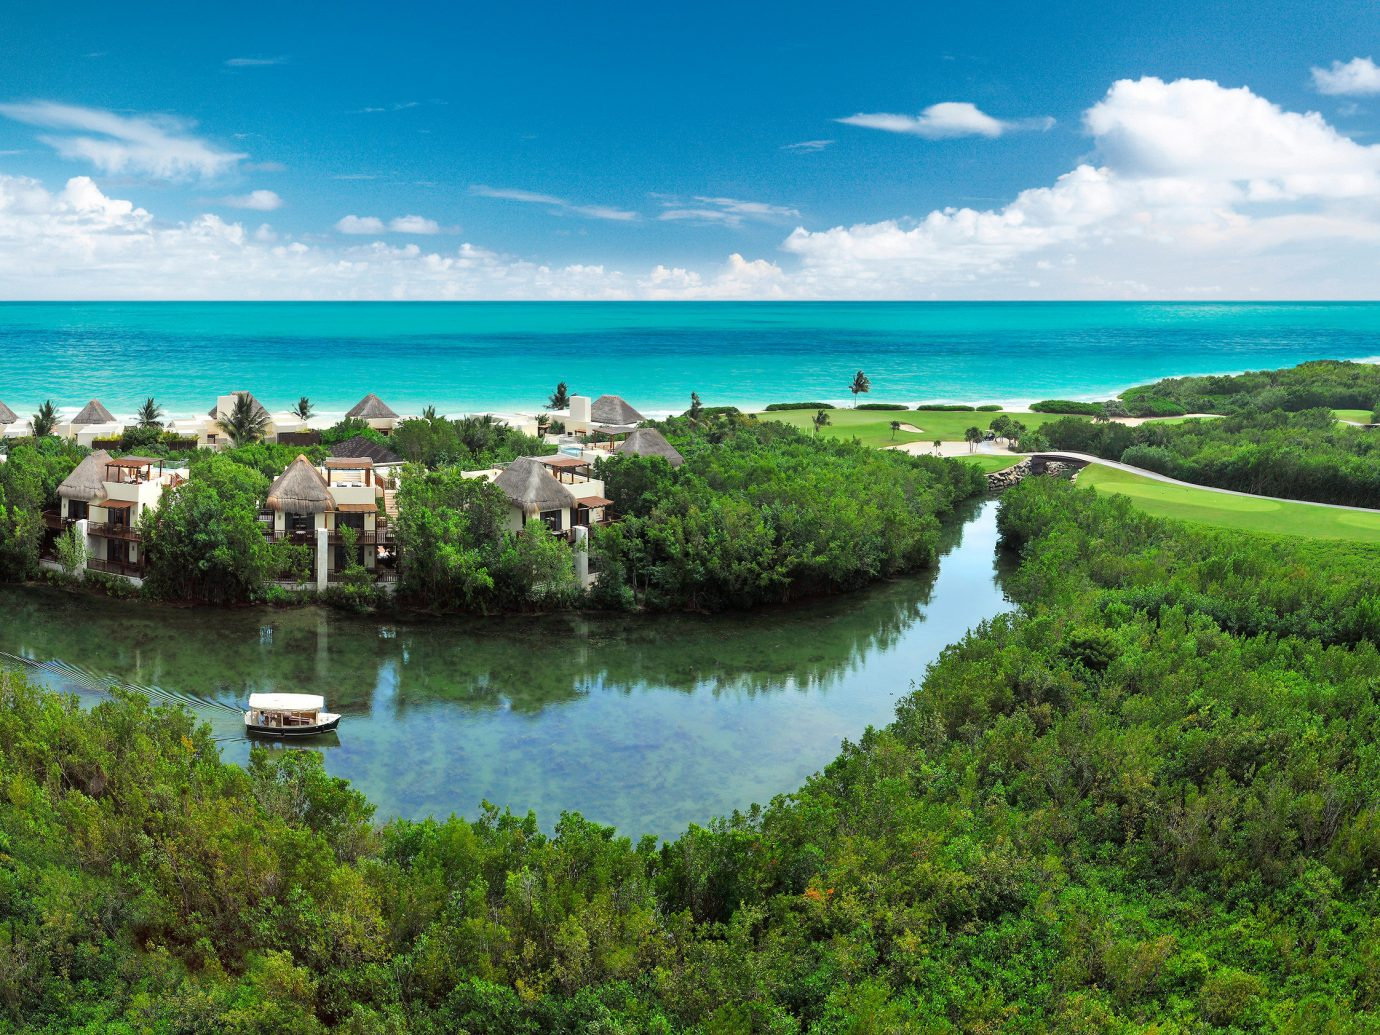 Hotels Travel Tips Trip Ideas grass sky outdoor water habitat Nature shore Coast Sea vacation bay Lagoon islet cape terrain lush